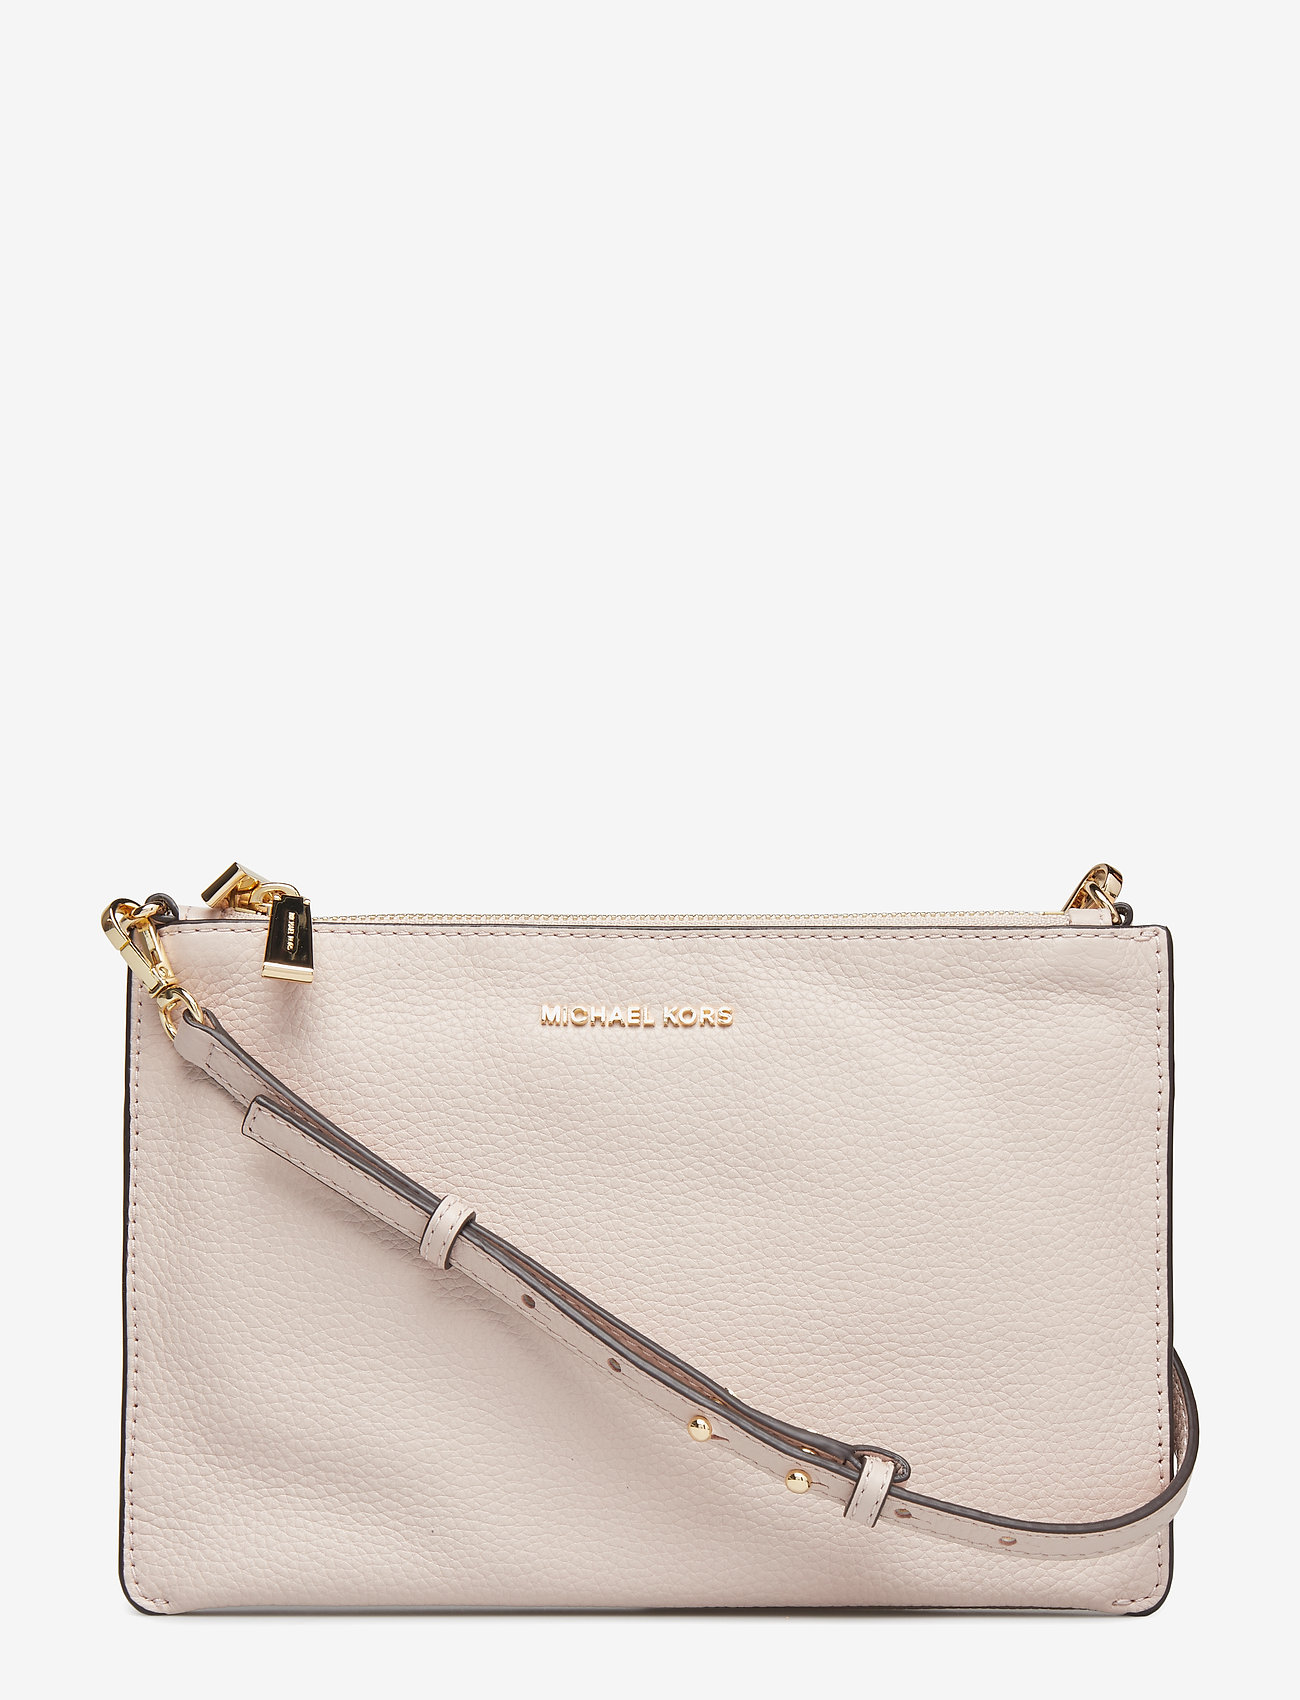 Michael Kors Bags - LG DBL POUCH XBODY - olkalaukut - soft pink